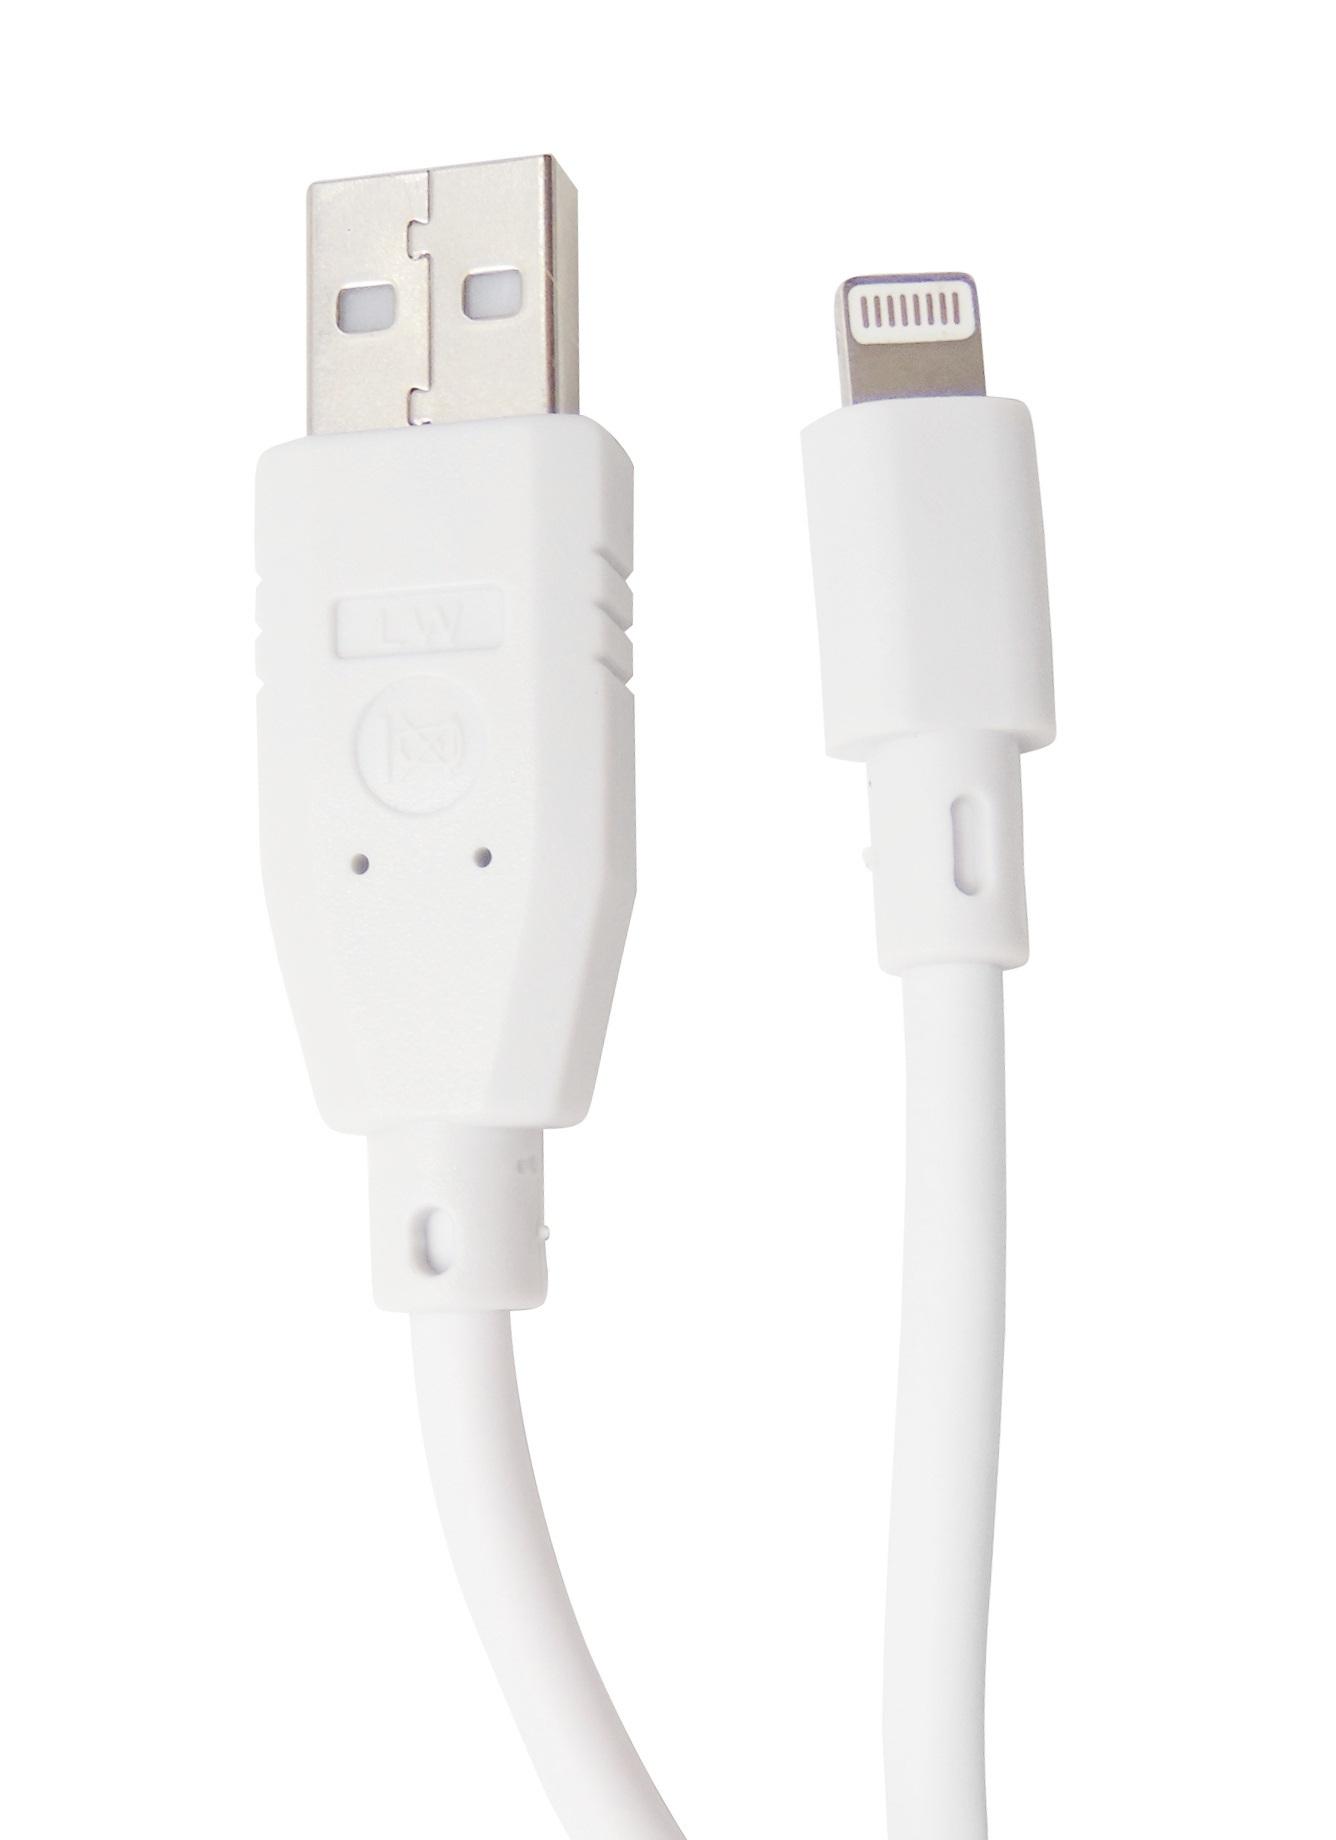 Cablu date si incarcare HighSpeed Lightning - USB 2.0 alb, 1,5 m lungime, pentru Apple iPhone, iPad, iPad